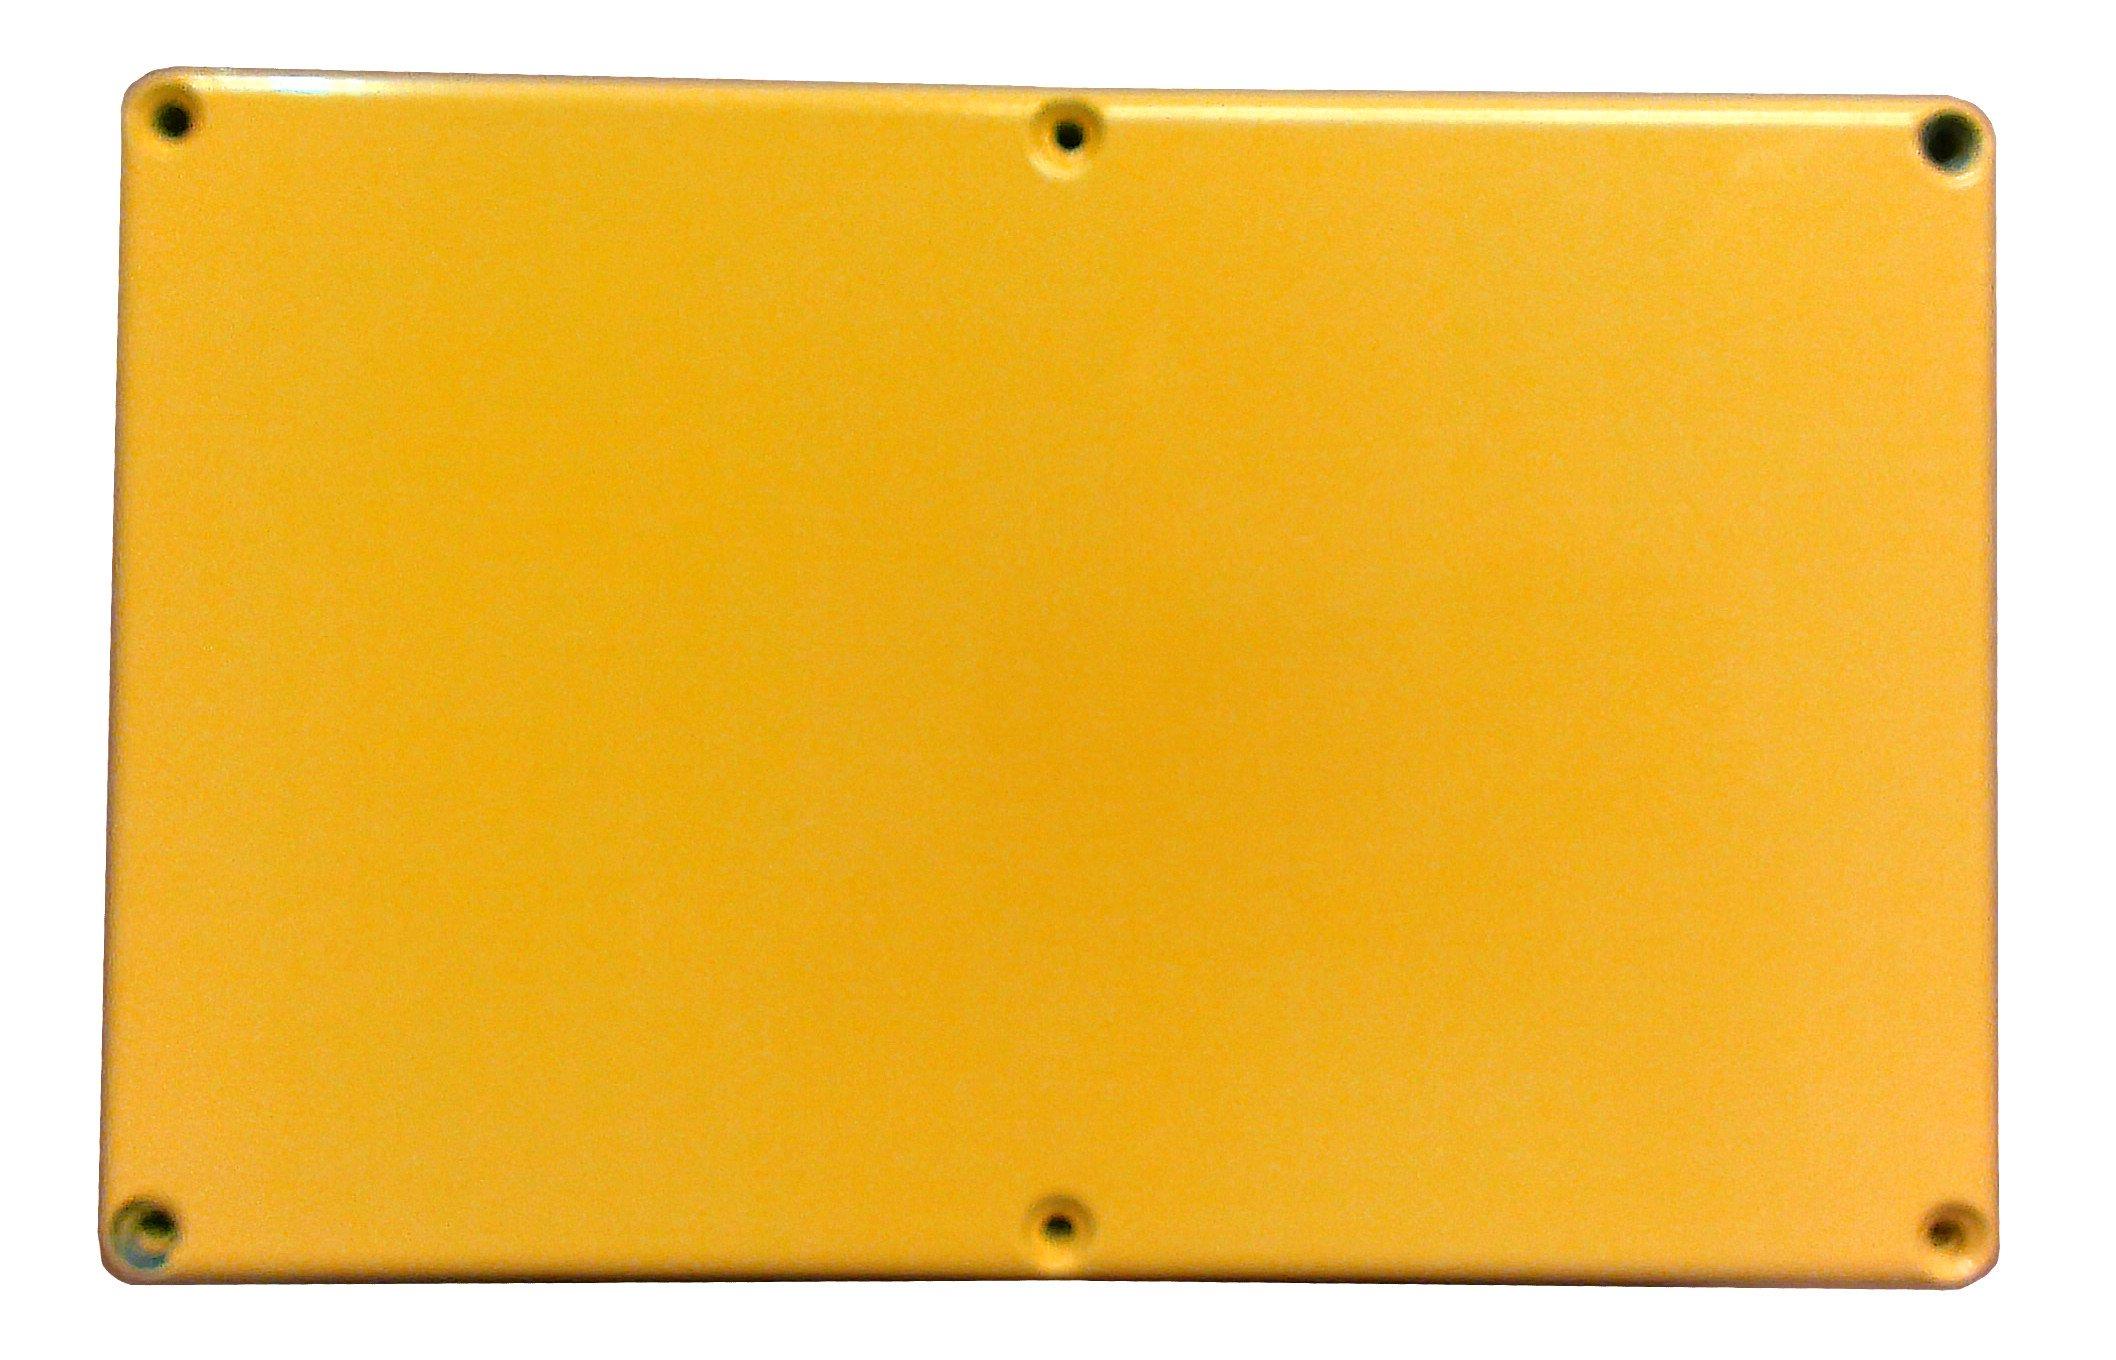 Hammond 1590EYL Yellow Diecast Aluminum Enclosure -- Inches (7.38'' x 4.70'' x 3.07'') mm (188mm x 120mm x 78mm)